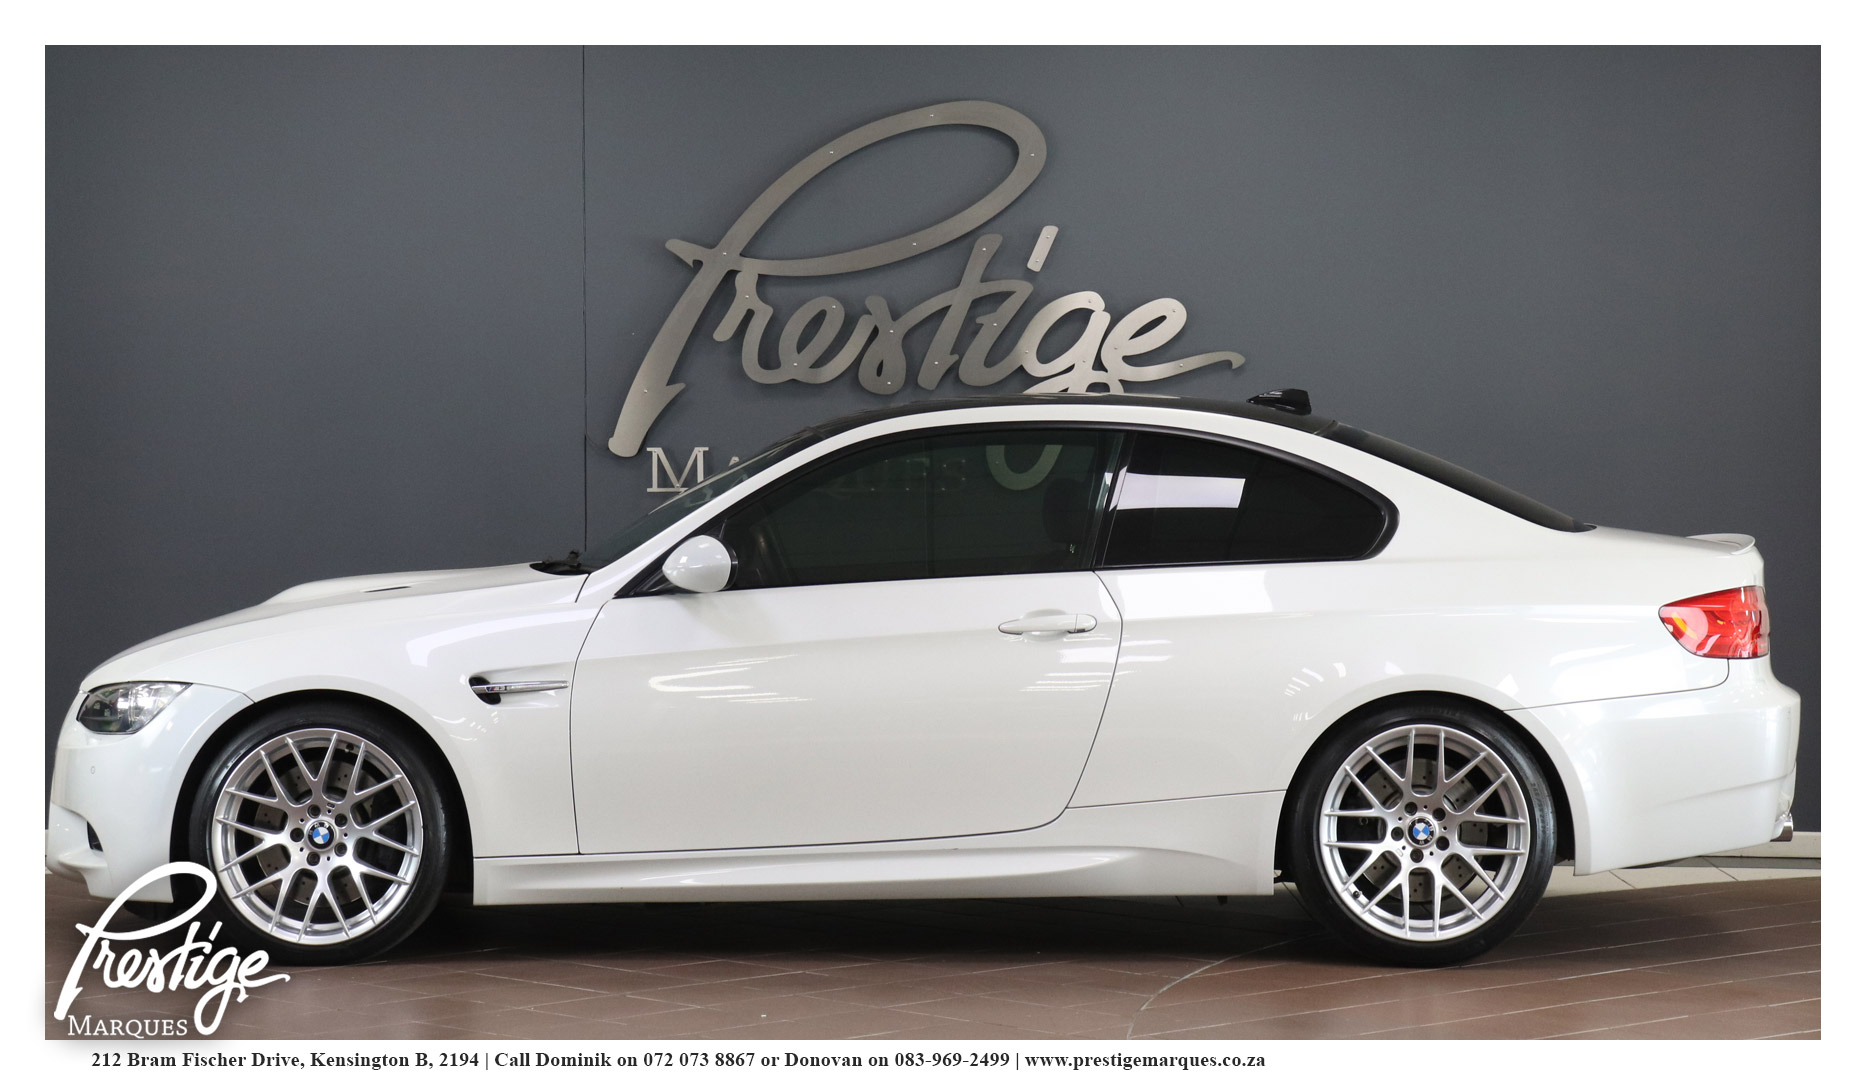 2011-BMW-E92-M3-MDCT-Competition-Package-Prestige-Marques-Randburg-Sandton-6